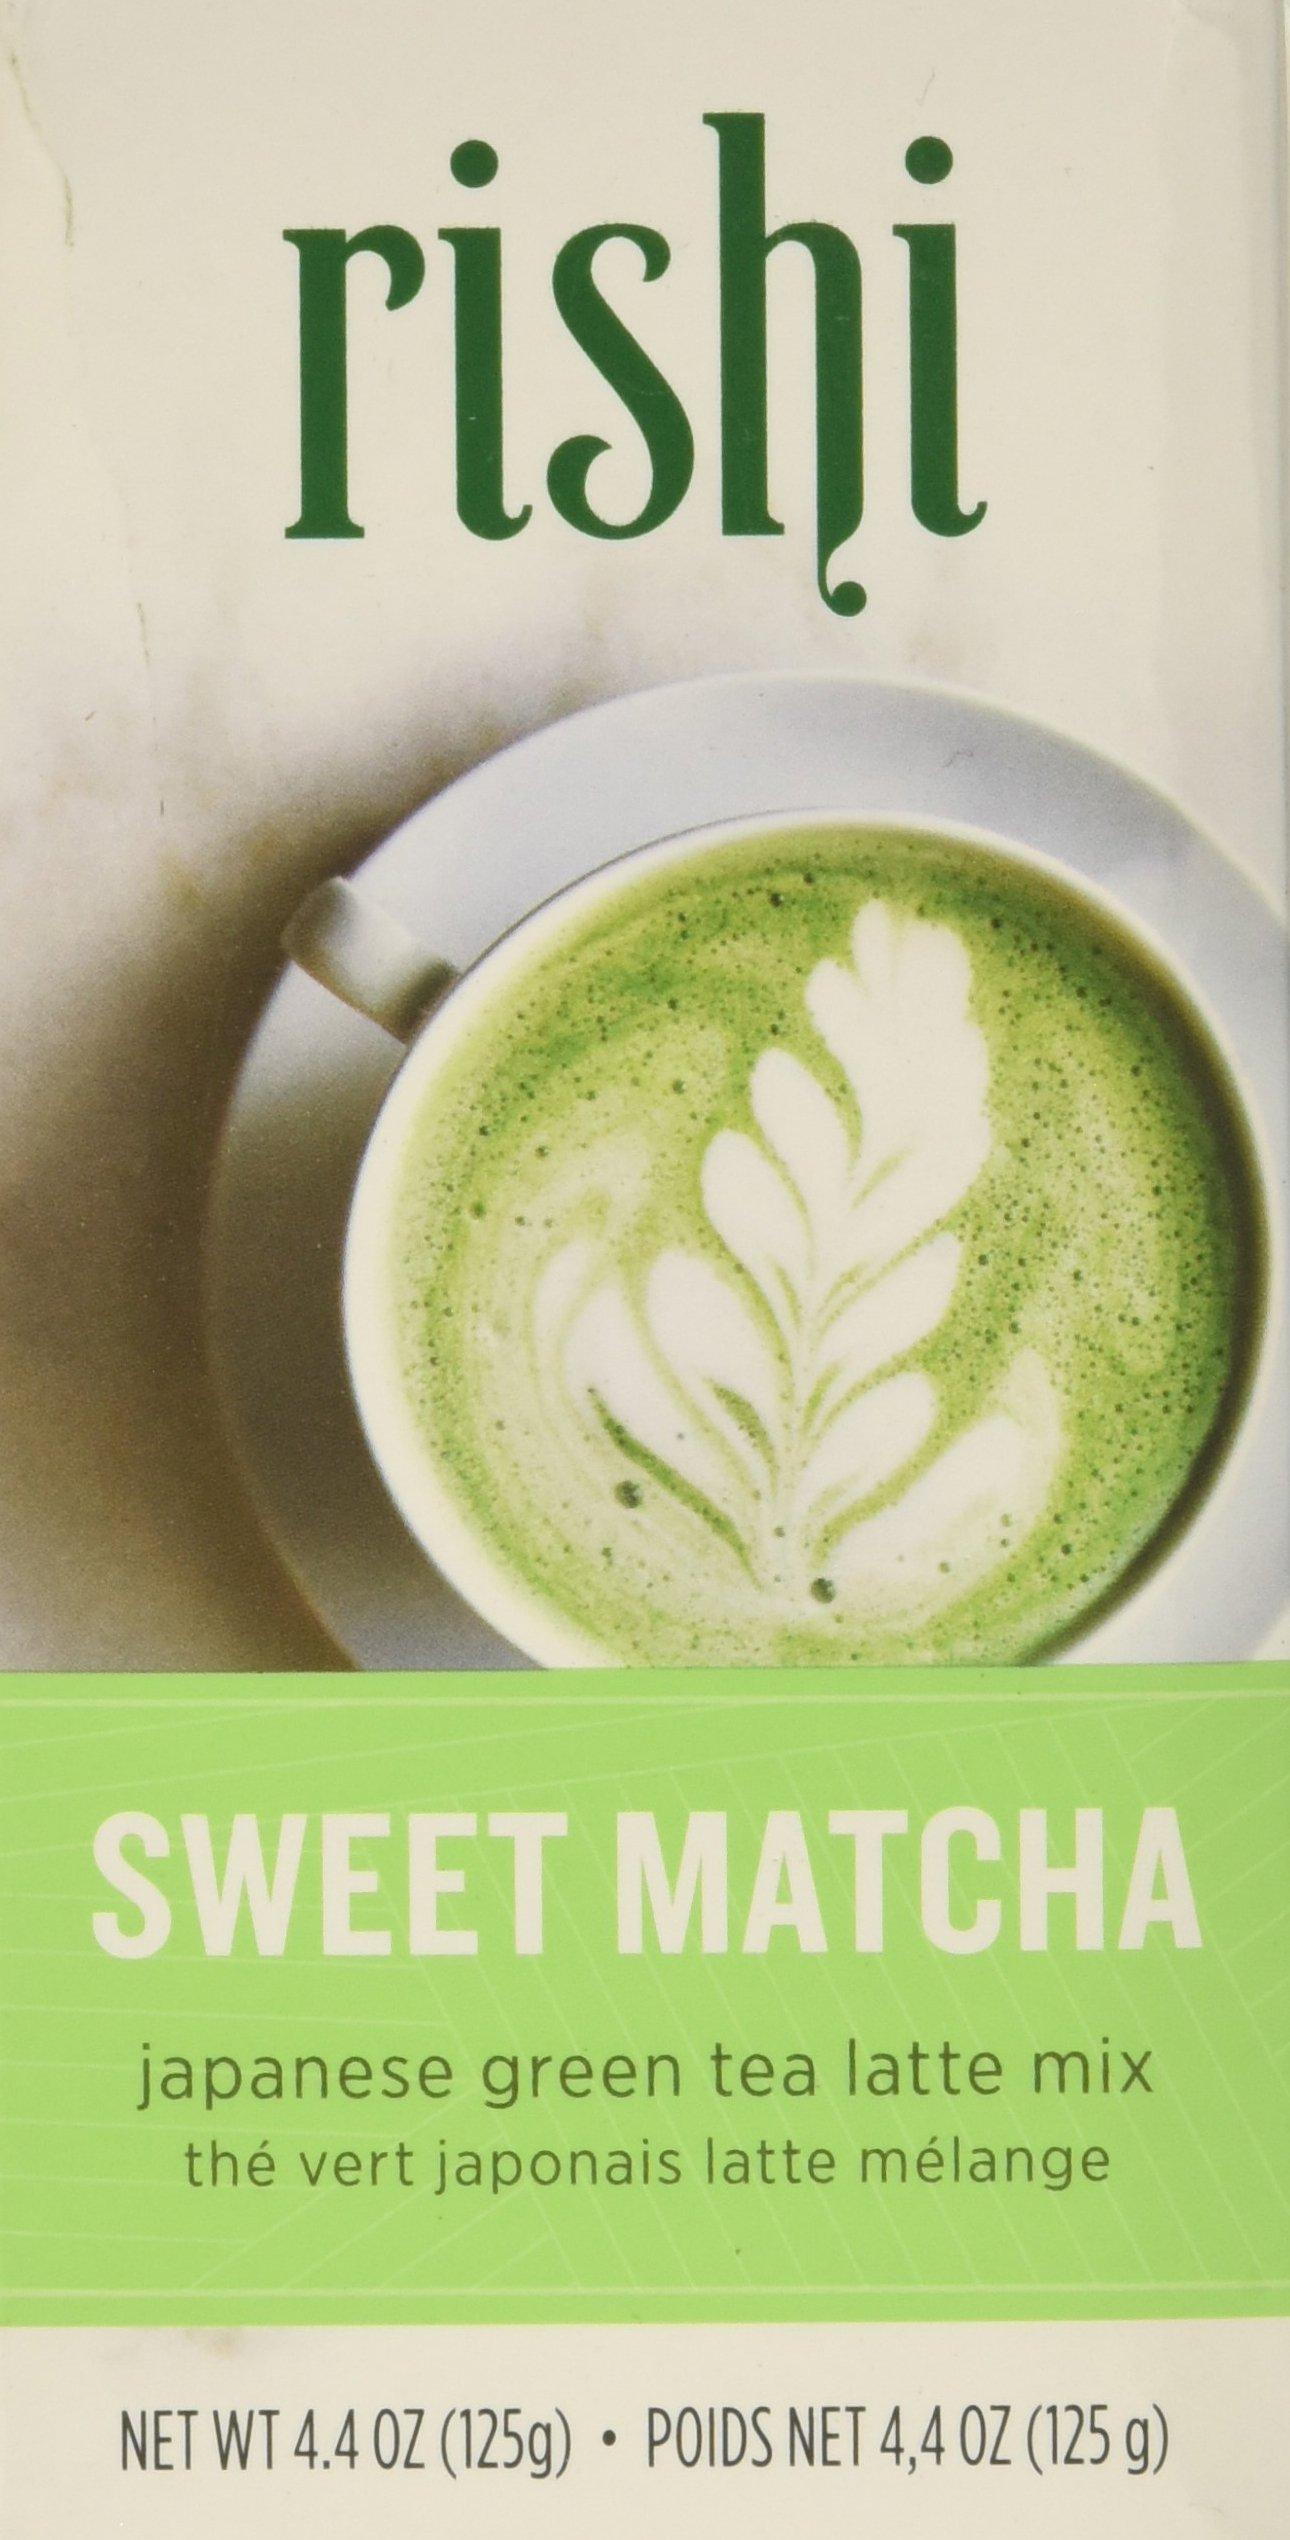 Rishi Sweet Matcha Tea, Japanese Green Tea Powder, 4.4 Oz